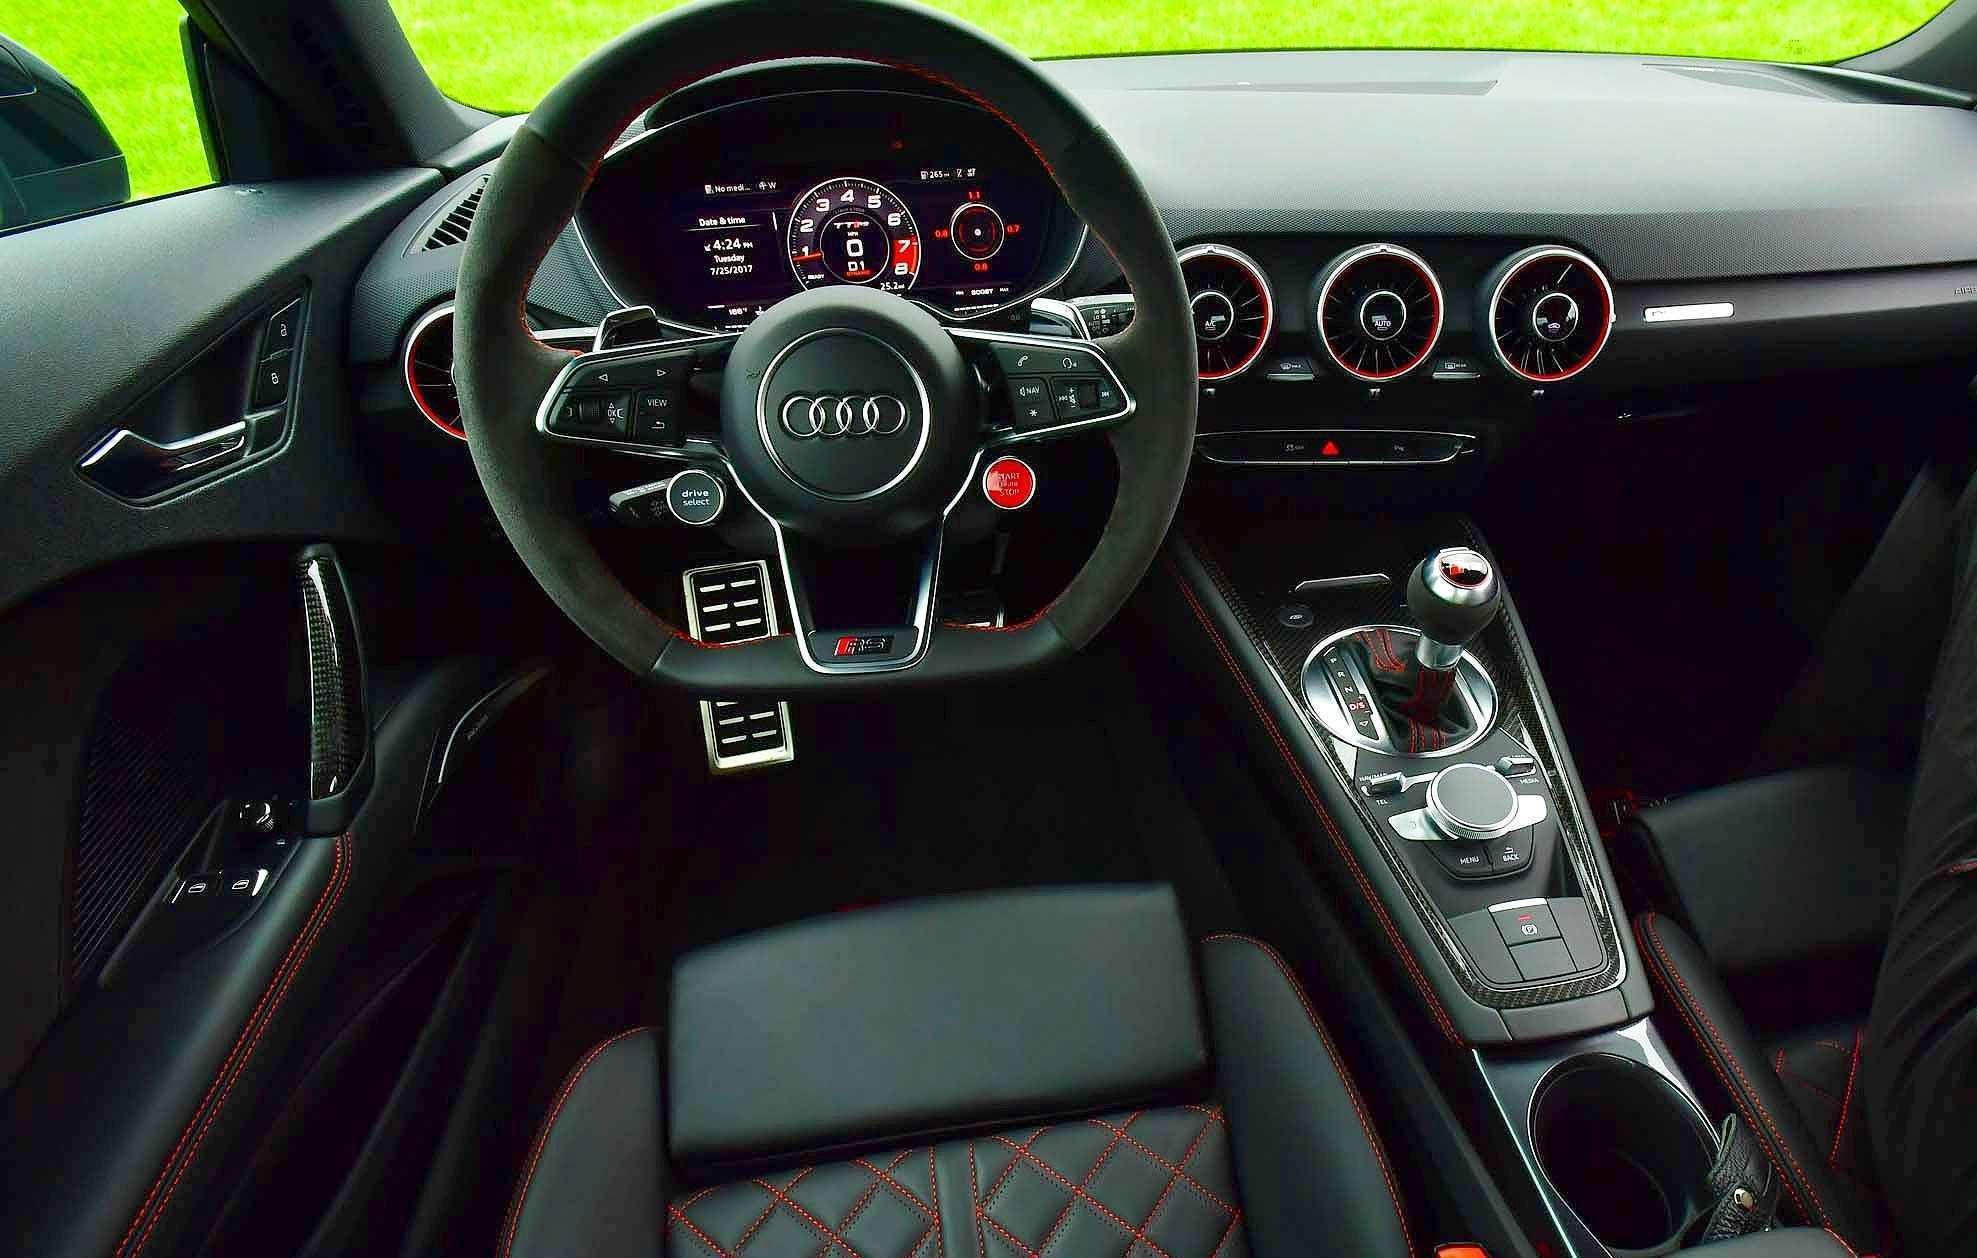 83 All New 2019 Audi Tt Specs New Concept with 2019 Audi Tt Specs